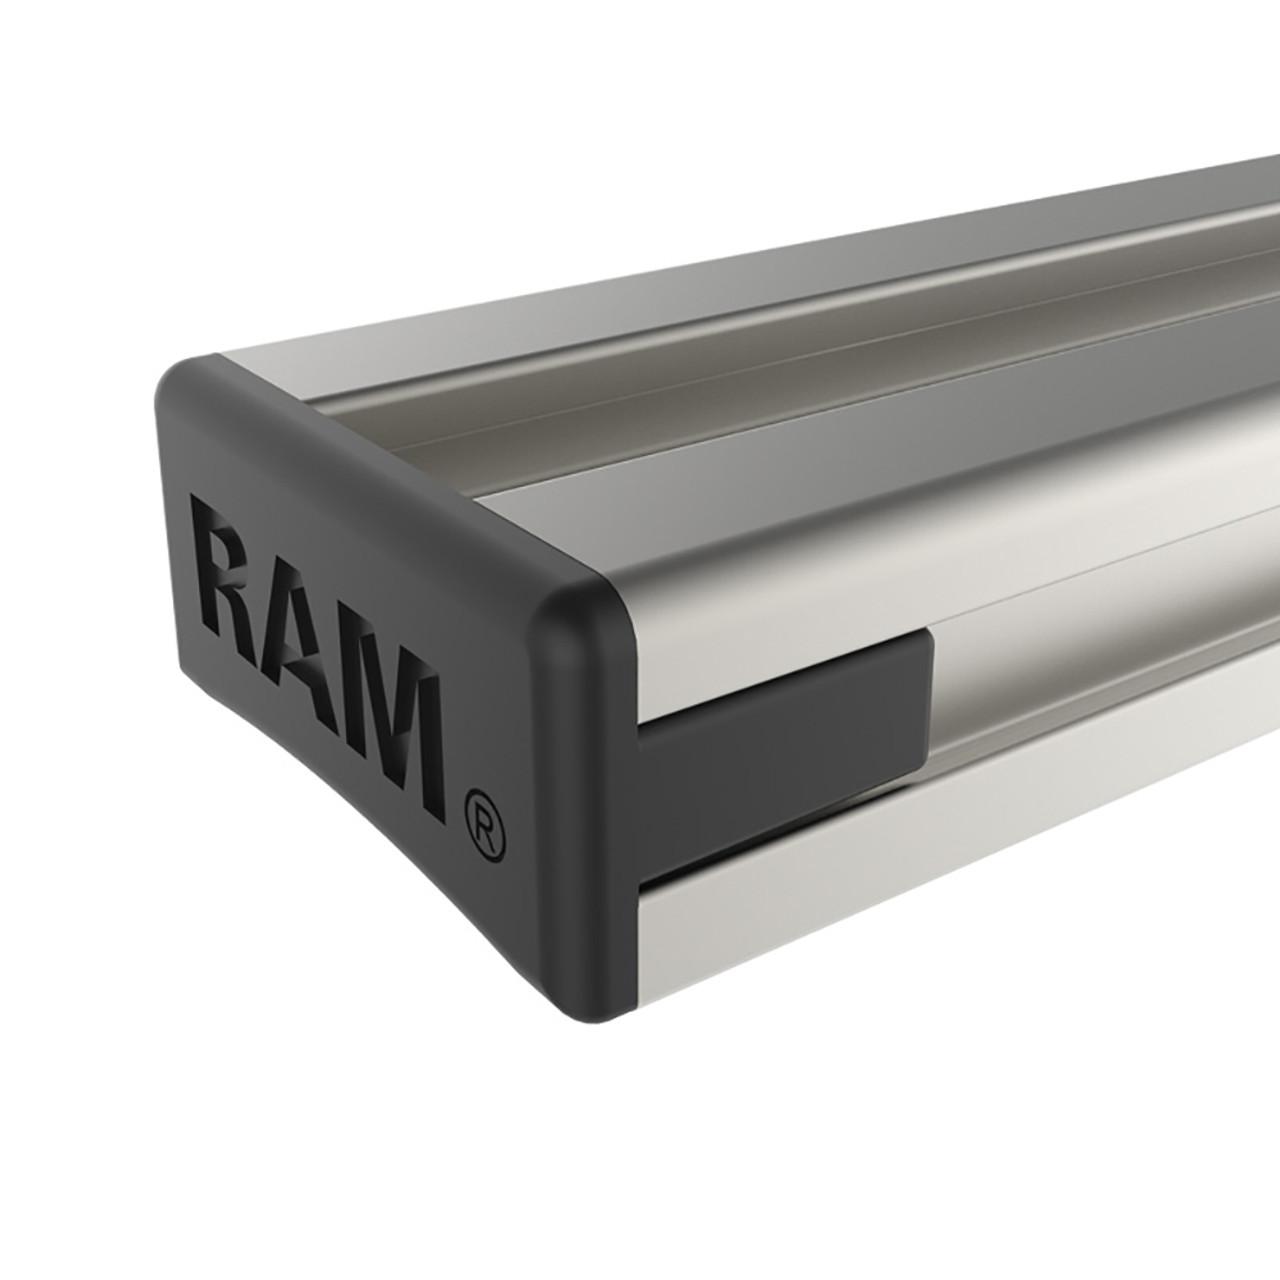 "Ram Mount 13"" Extruded Aluminum Tough-Track [RAM-TRACK-EXA-13]"